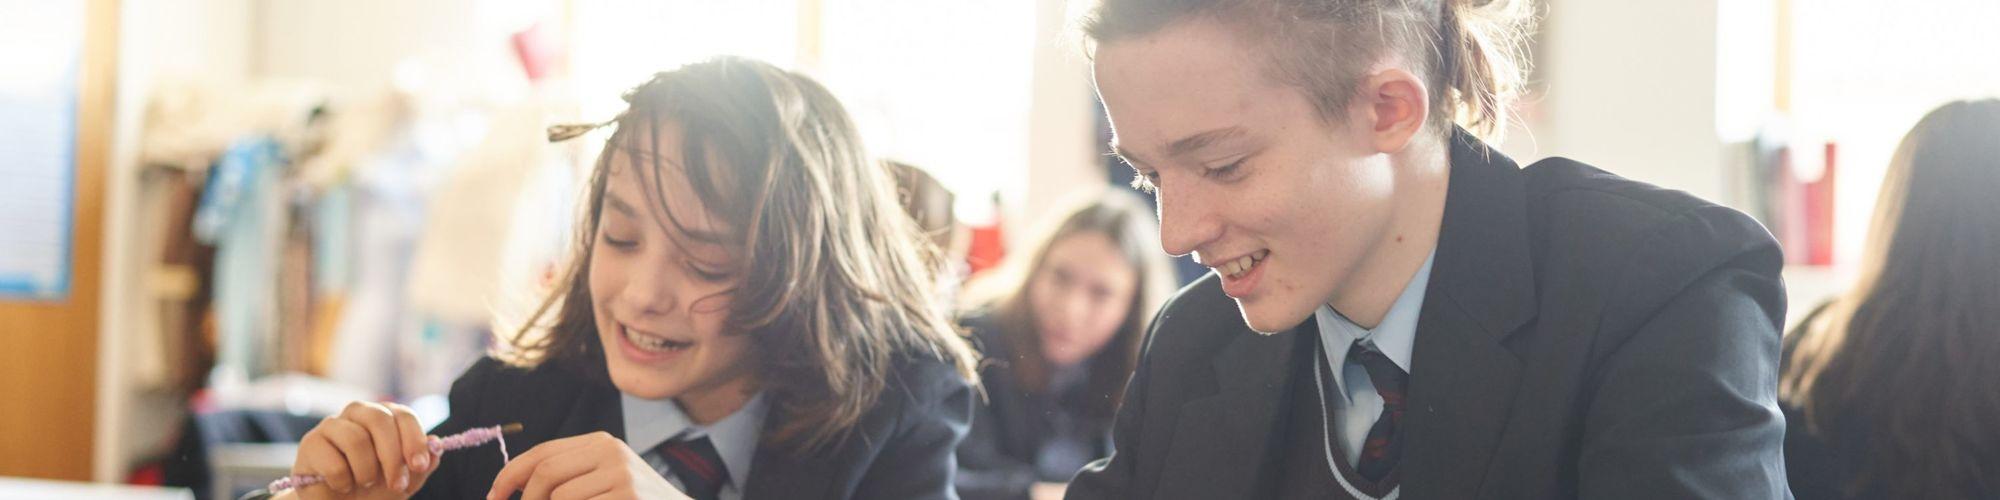 20 02 12.Chiswick School.1475 (web)